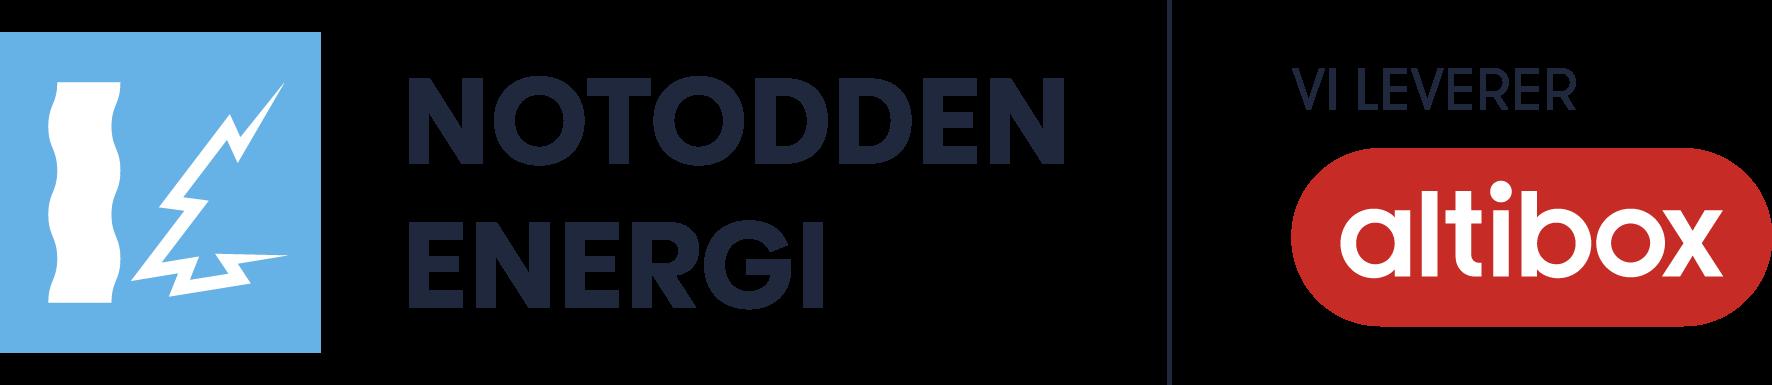 Altibox_NotoddenEnergi_rgb-10 2020